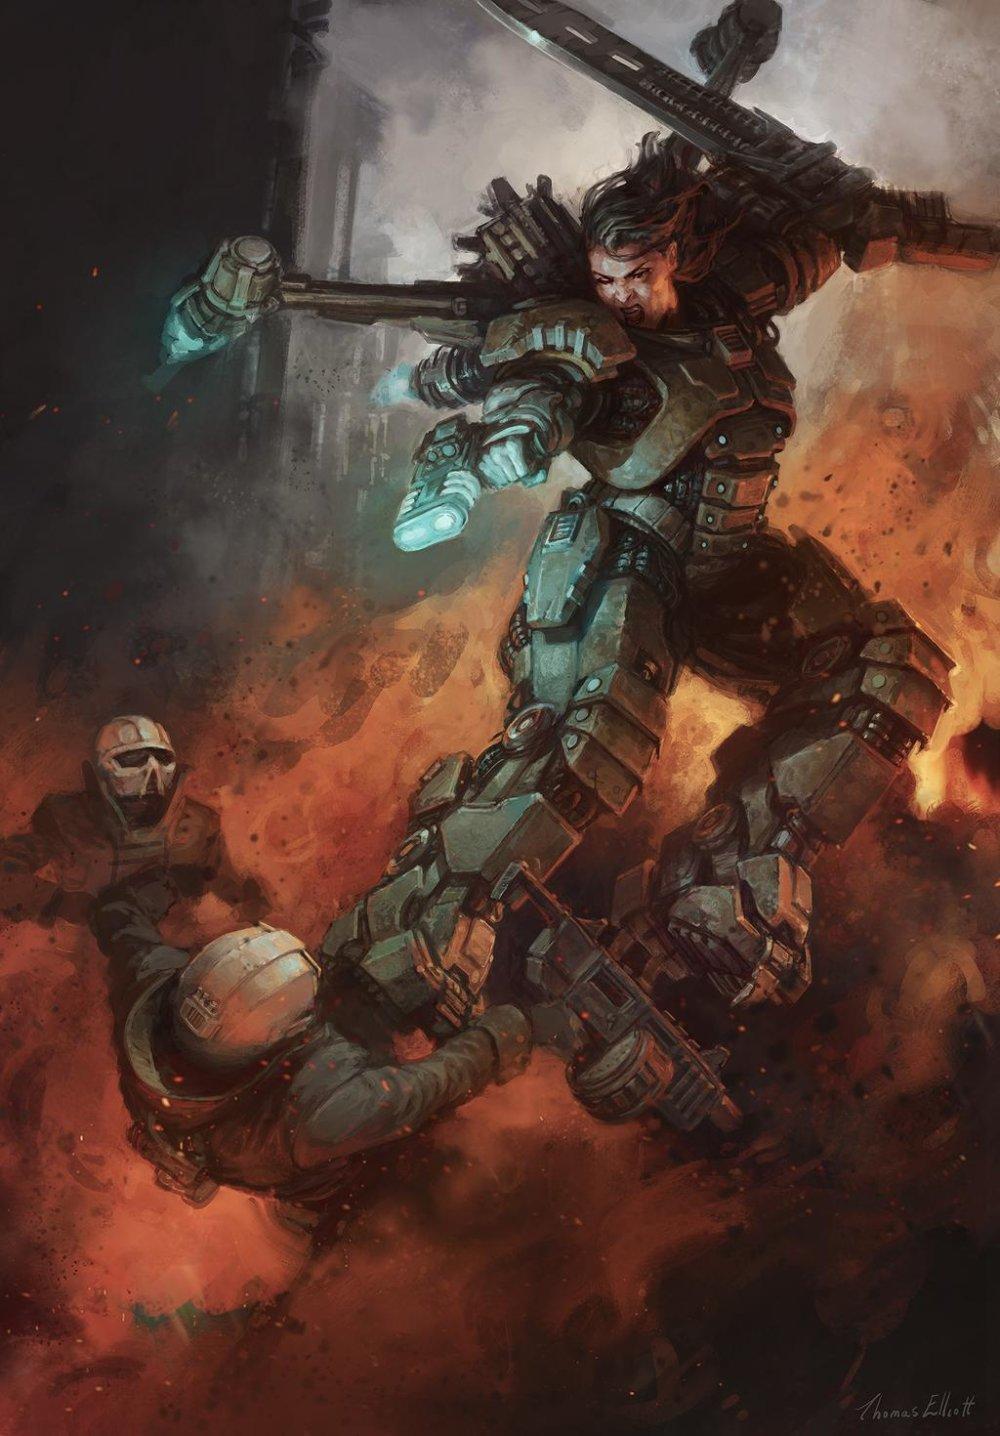 Amazing Cyberpunk Illustrations By Thomas Elliott 4